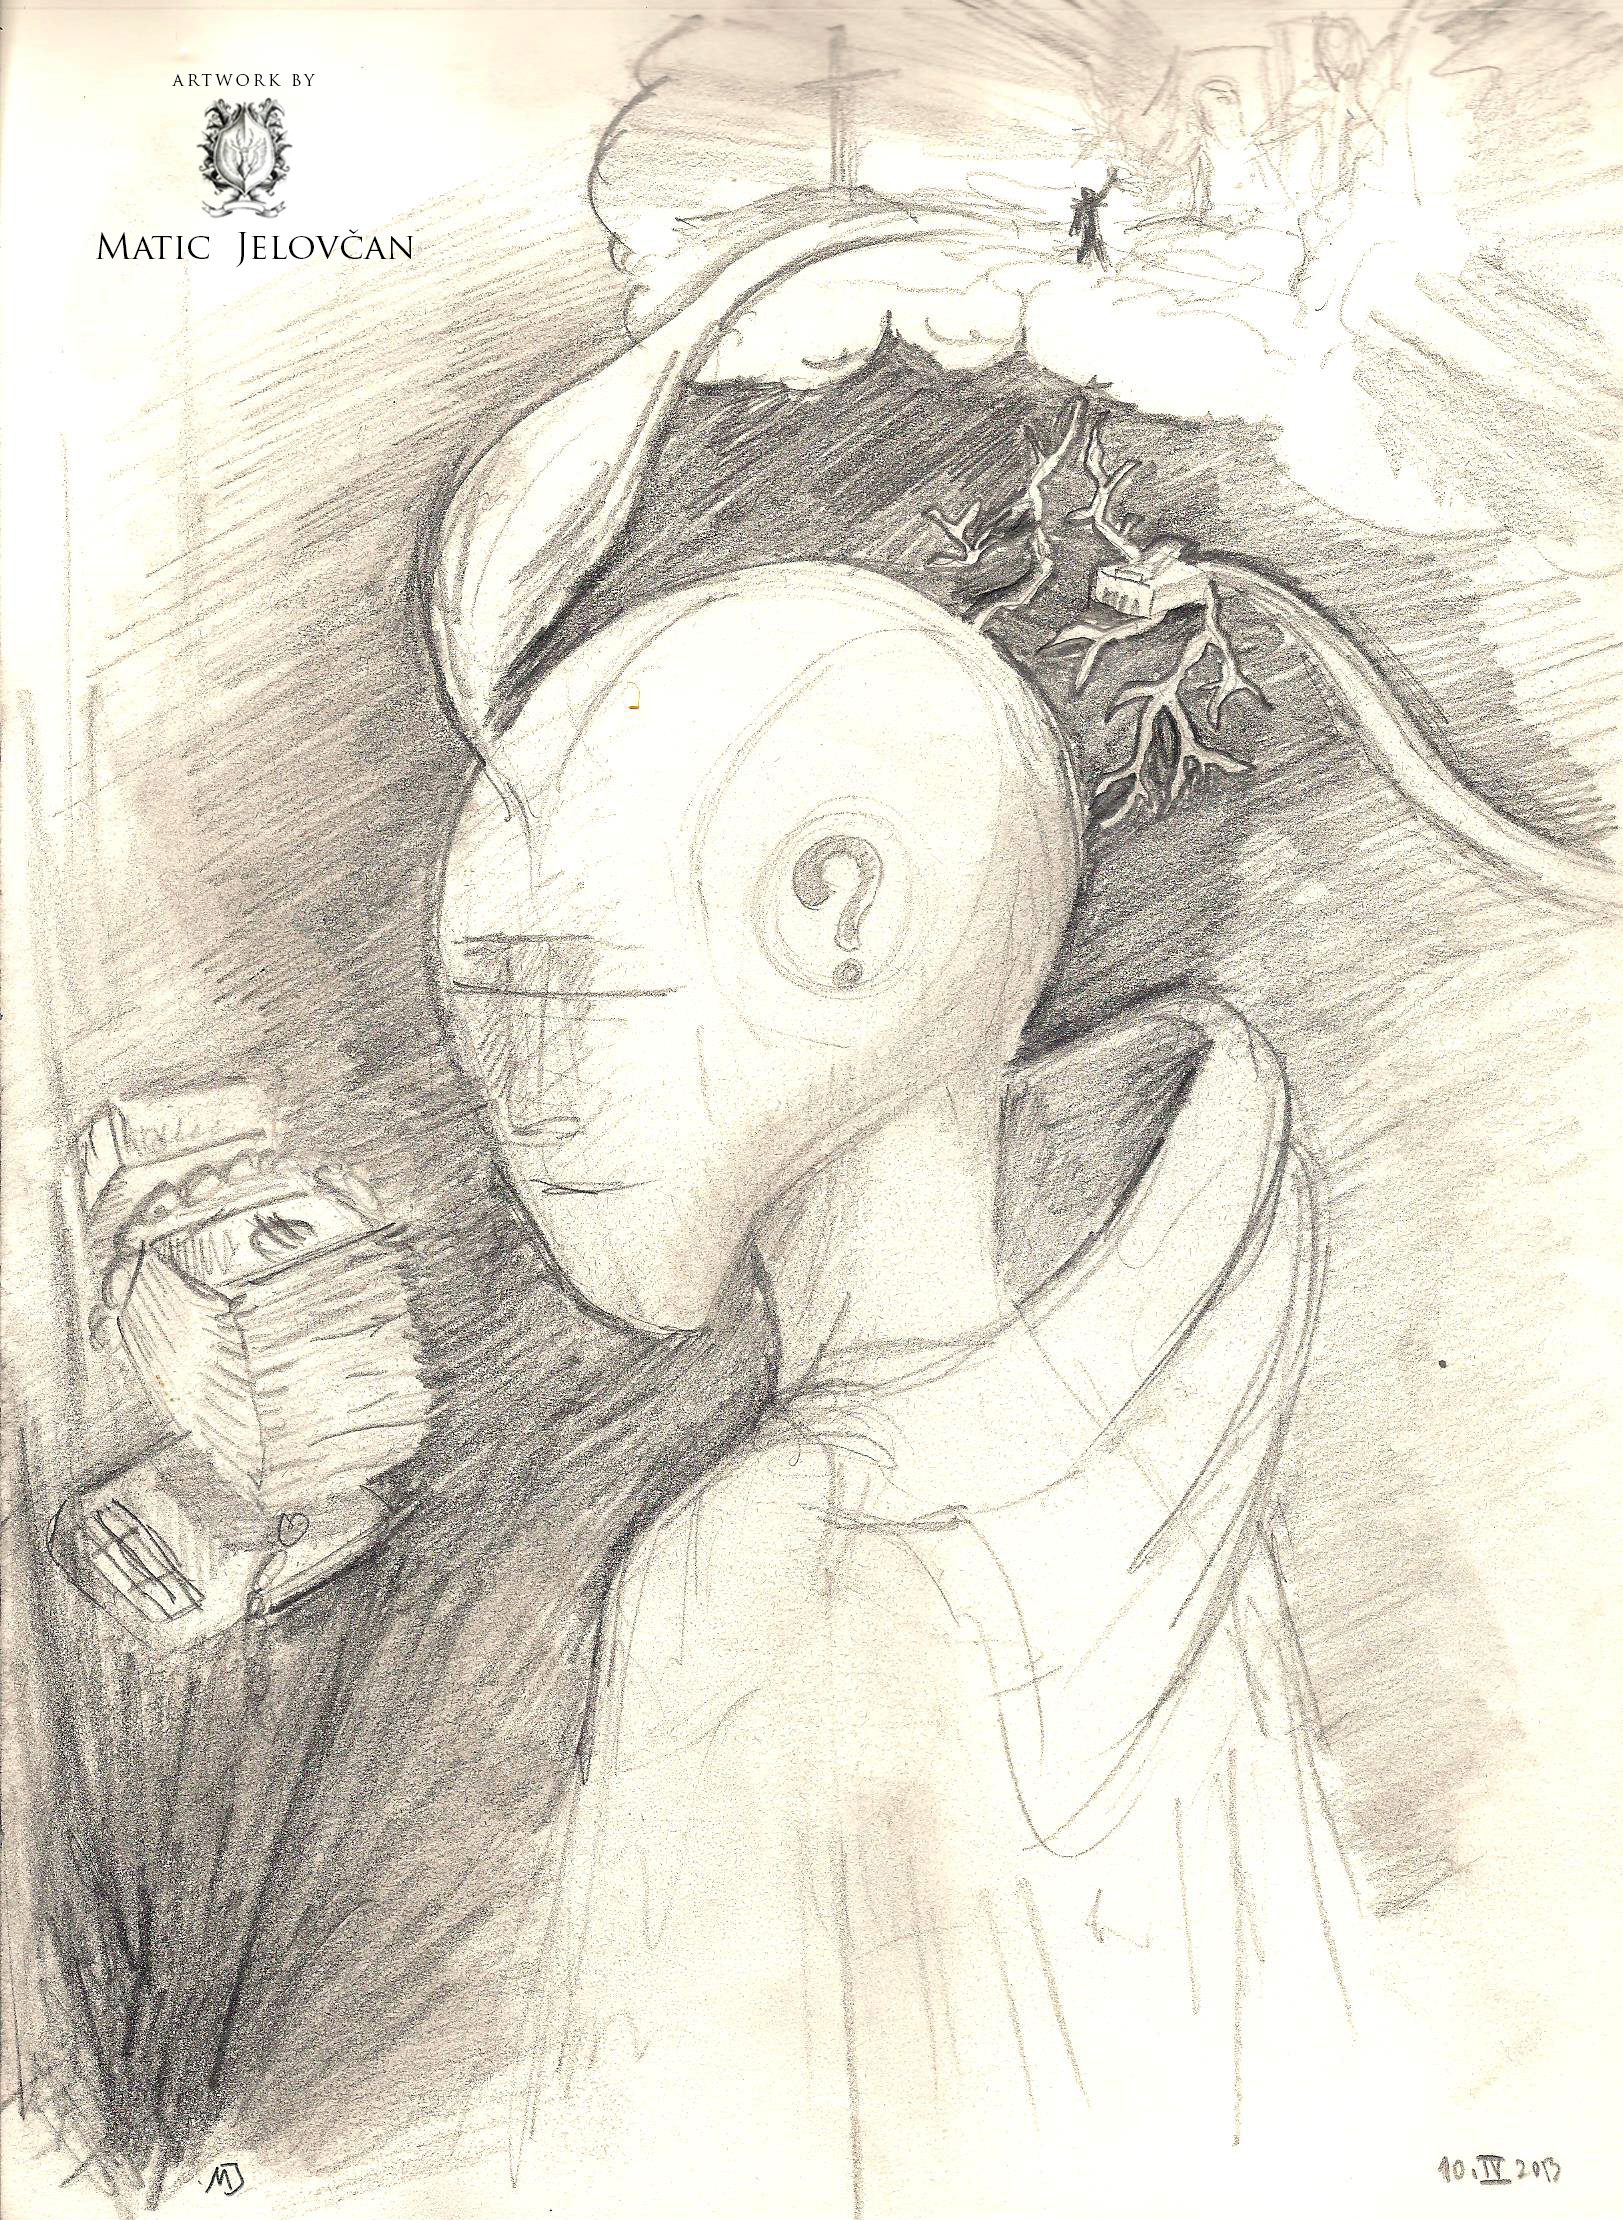 The Sketchbook 14